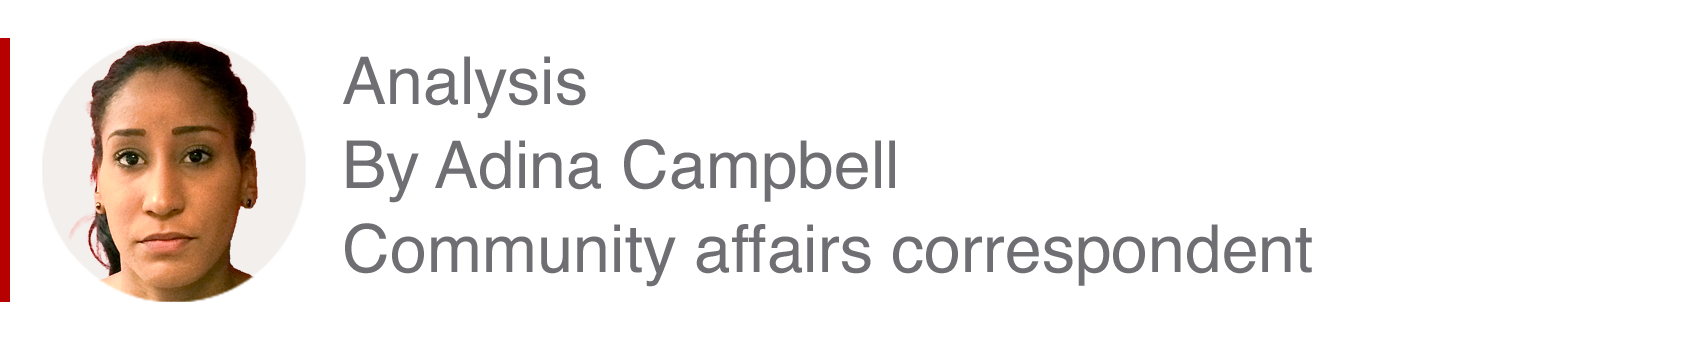 Analysis by Adina Campbell, community affairs correspondent